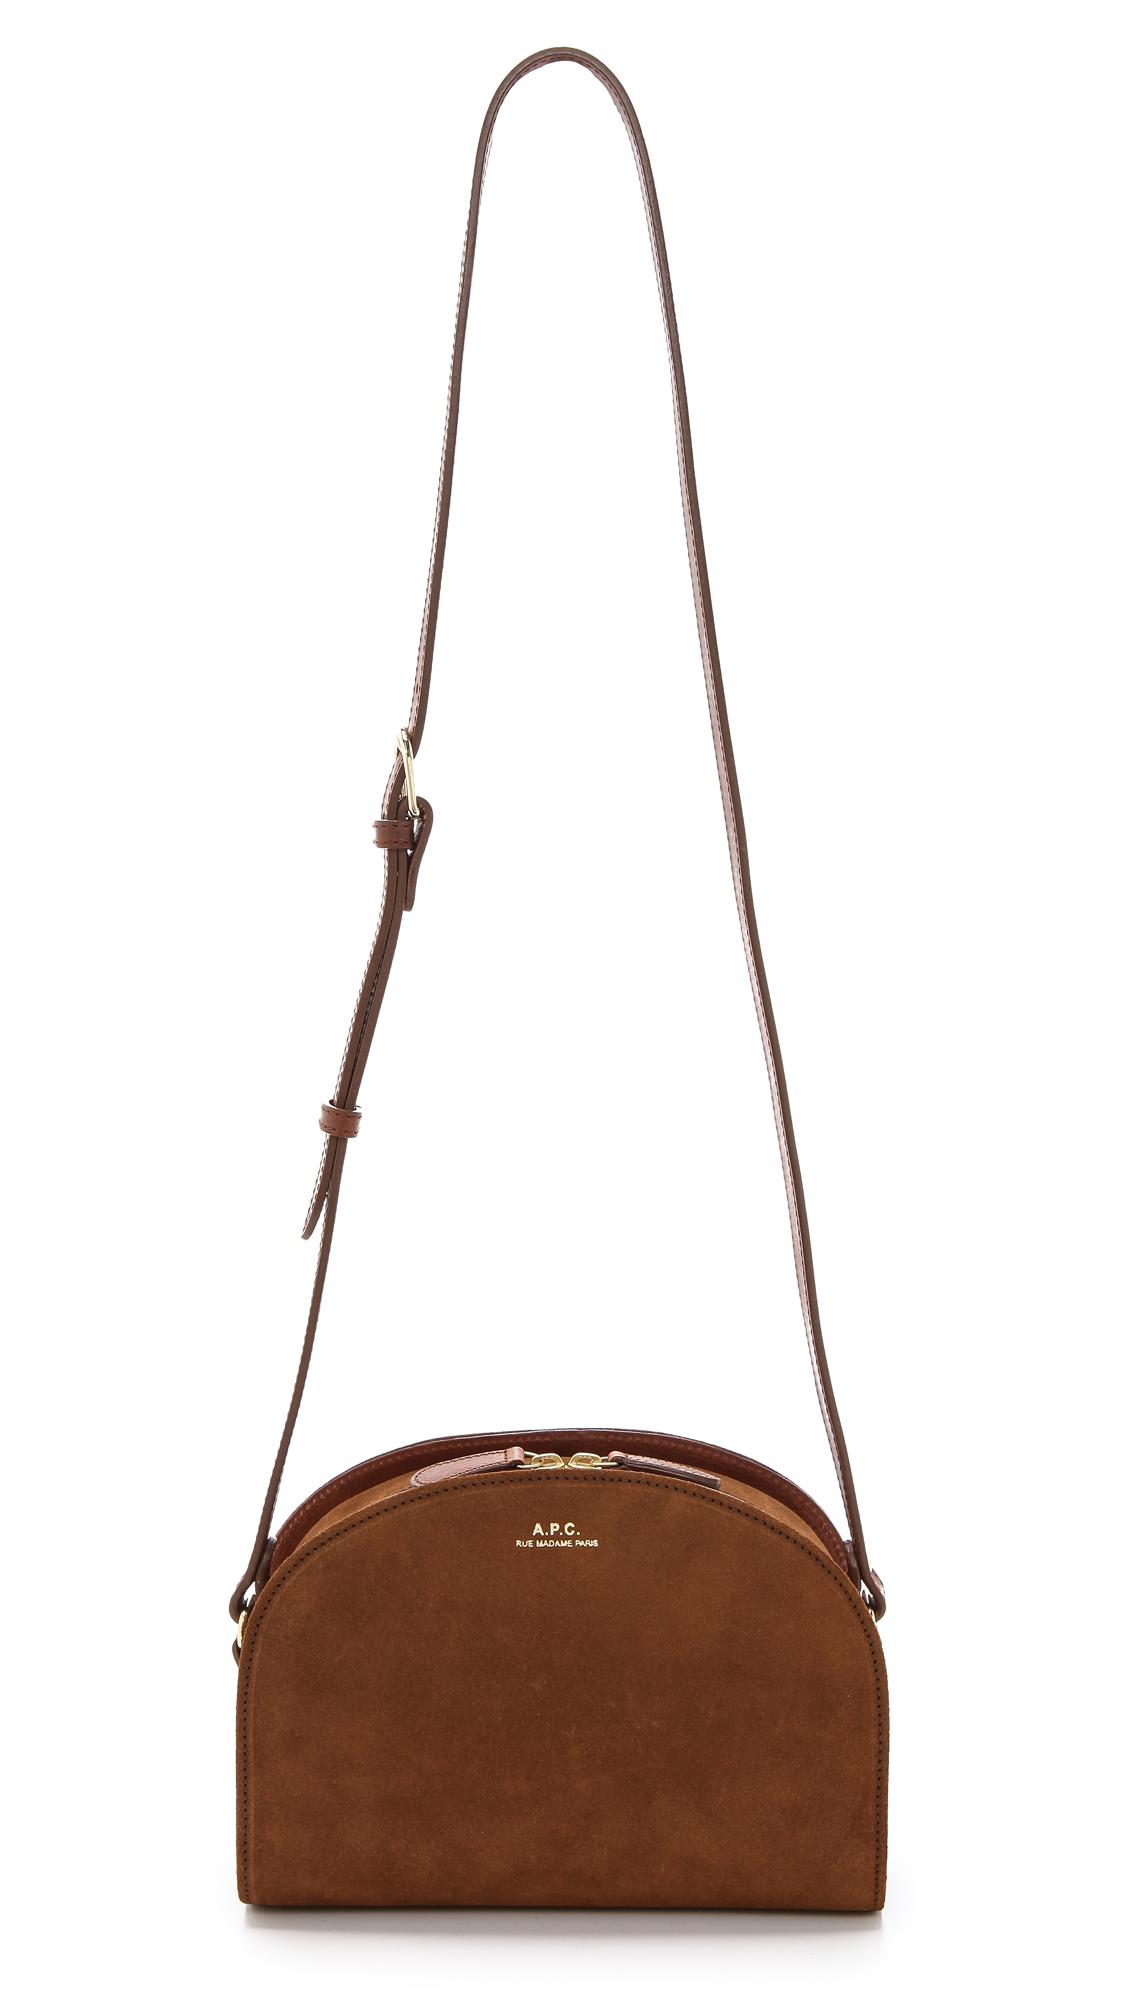 a p c half moon bag in brown maroon lyst. Black Bedroom Furniture Sets. Home Design Ideas